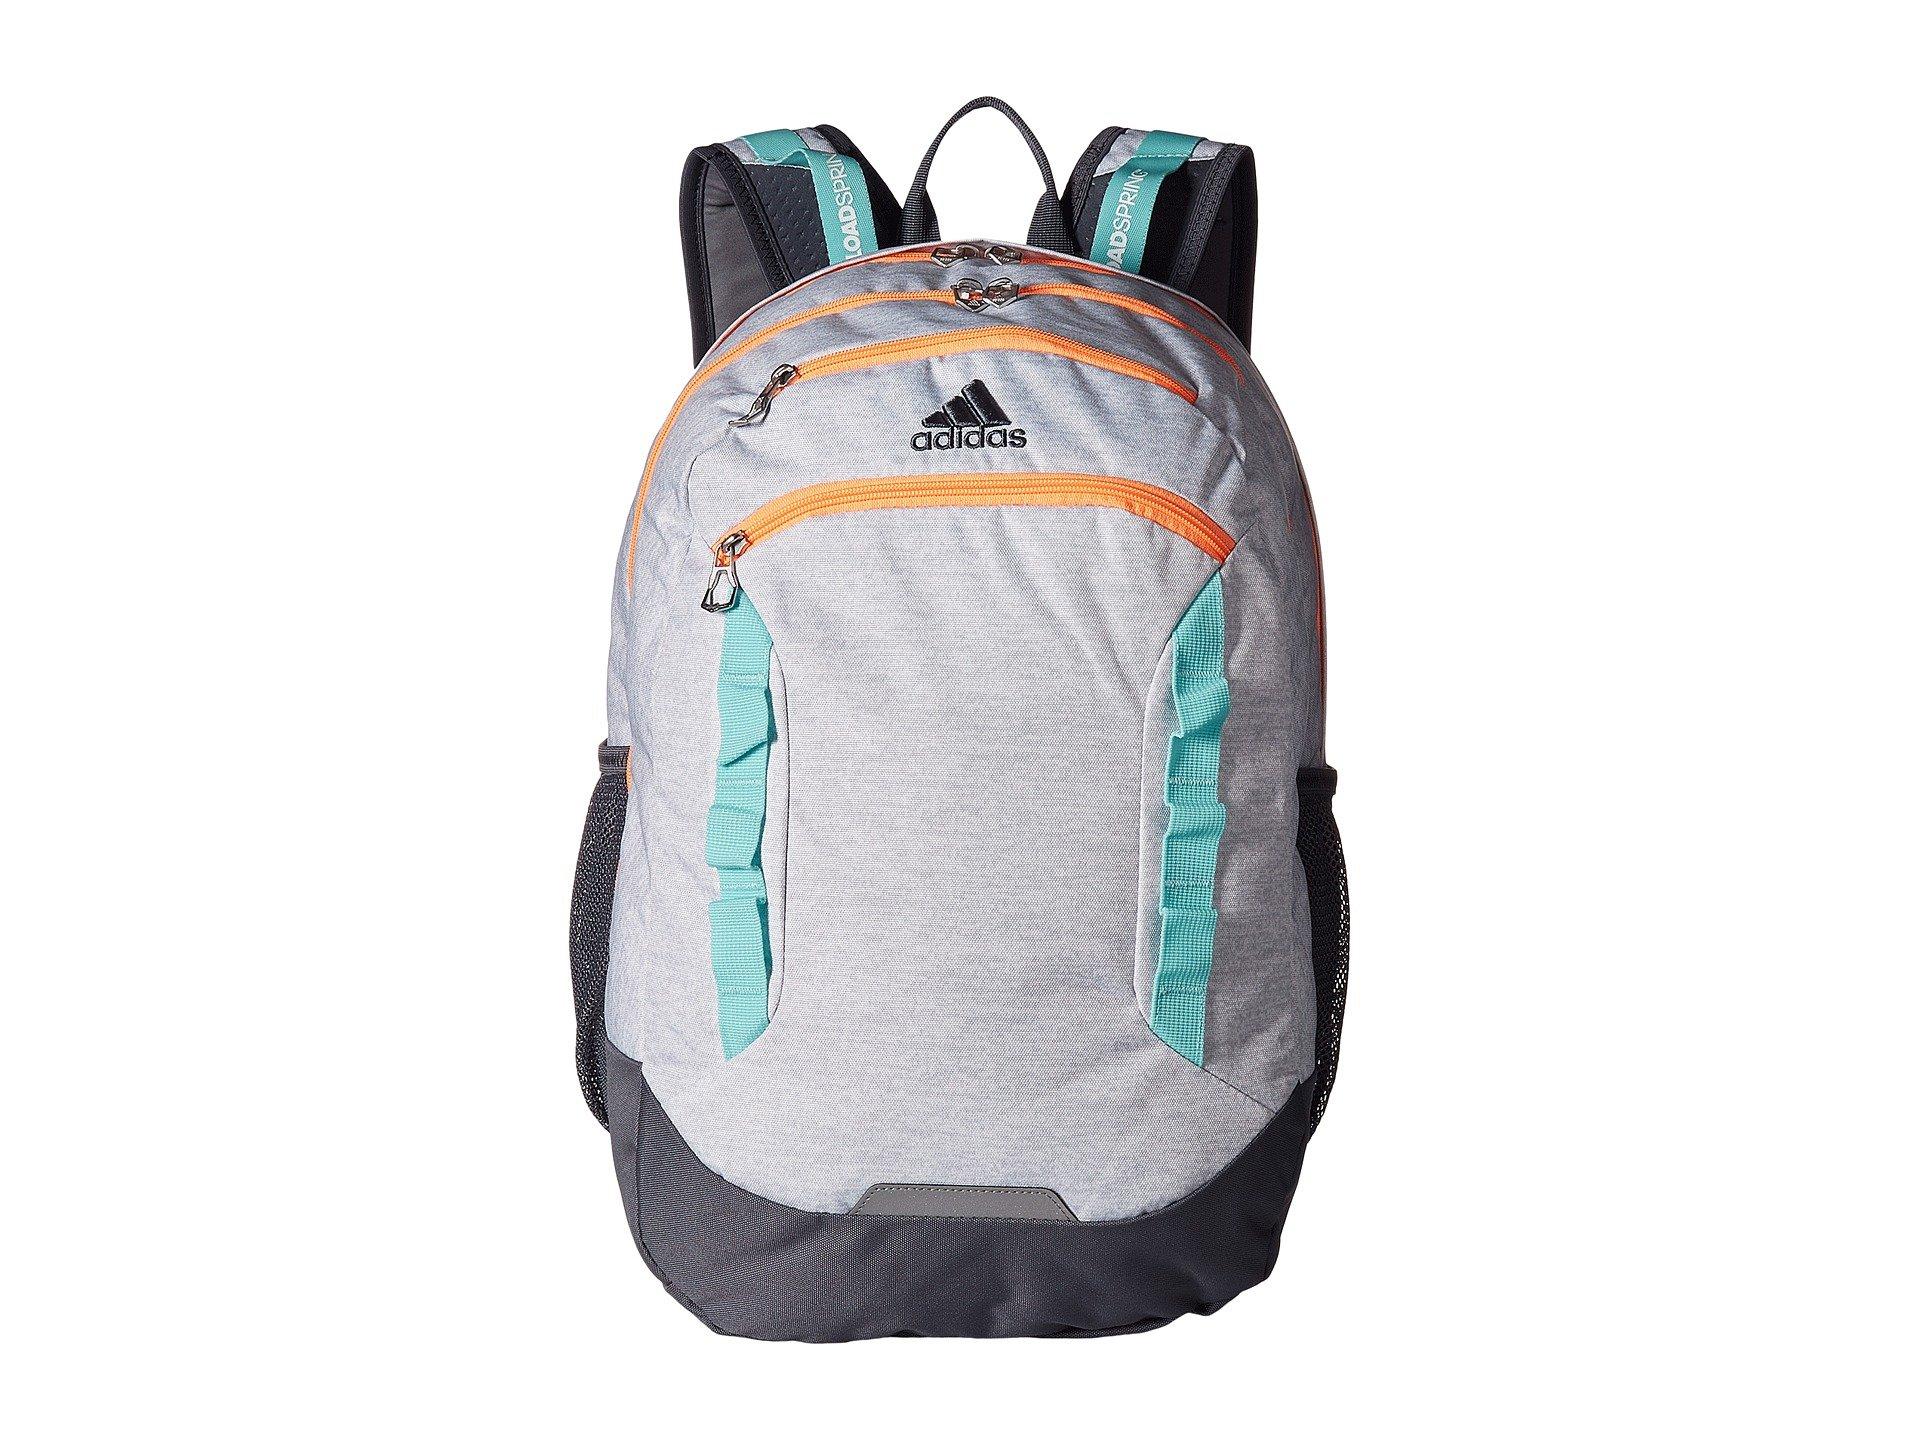 Adidas Originals Excel III mochila, blanco Jersey / flash naranja